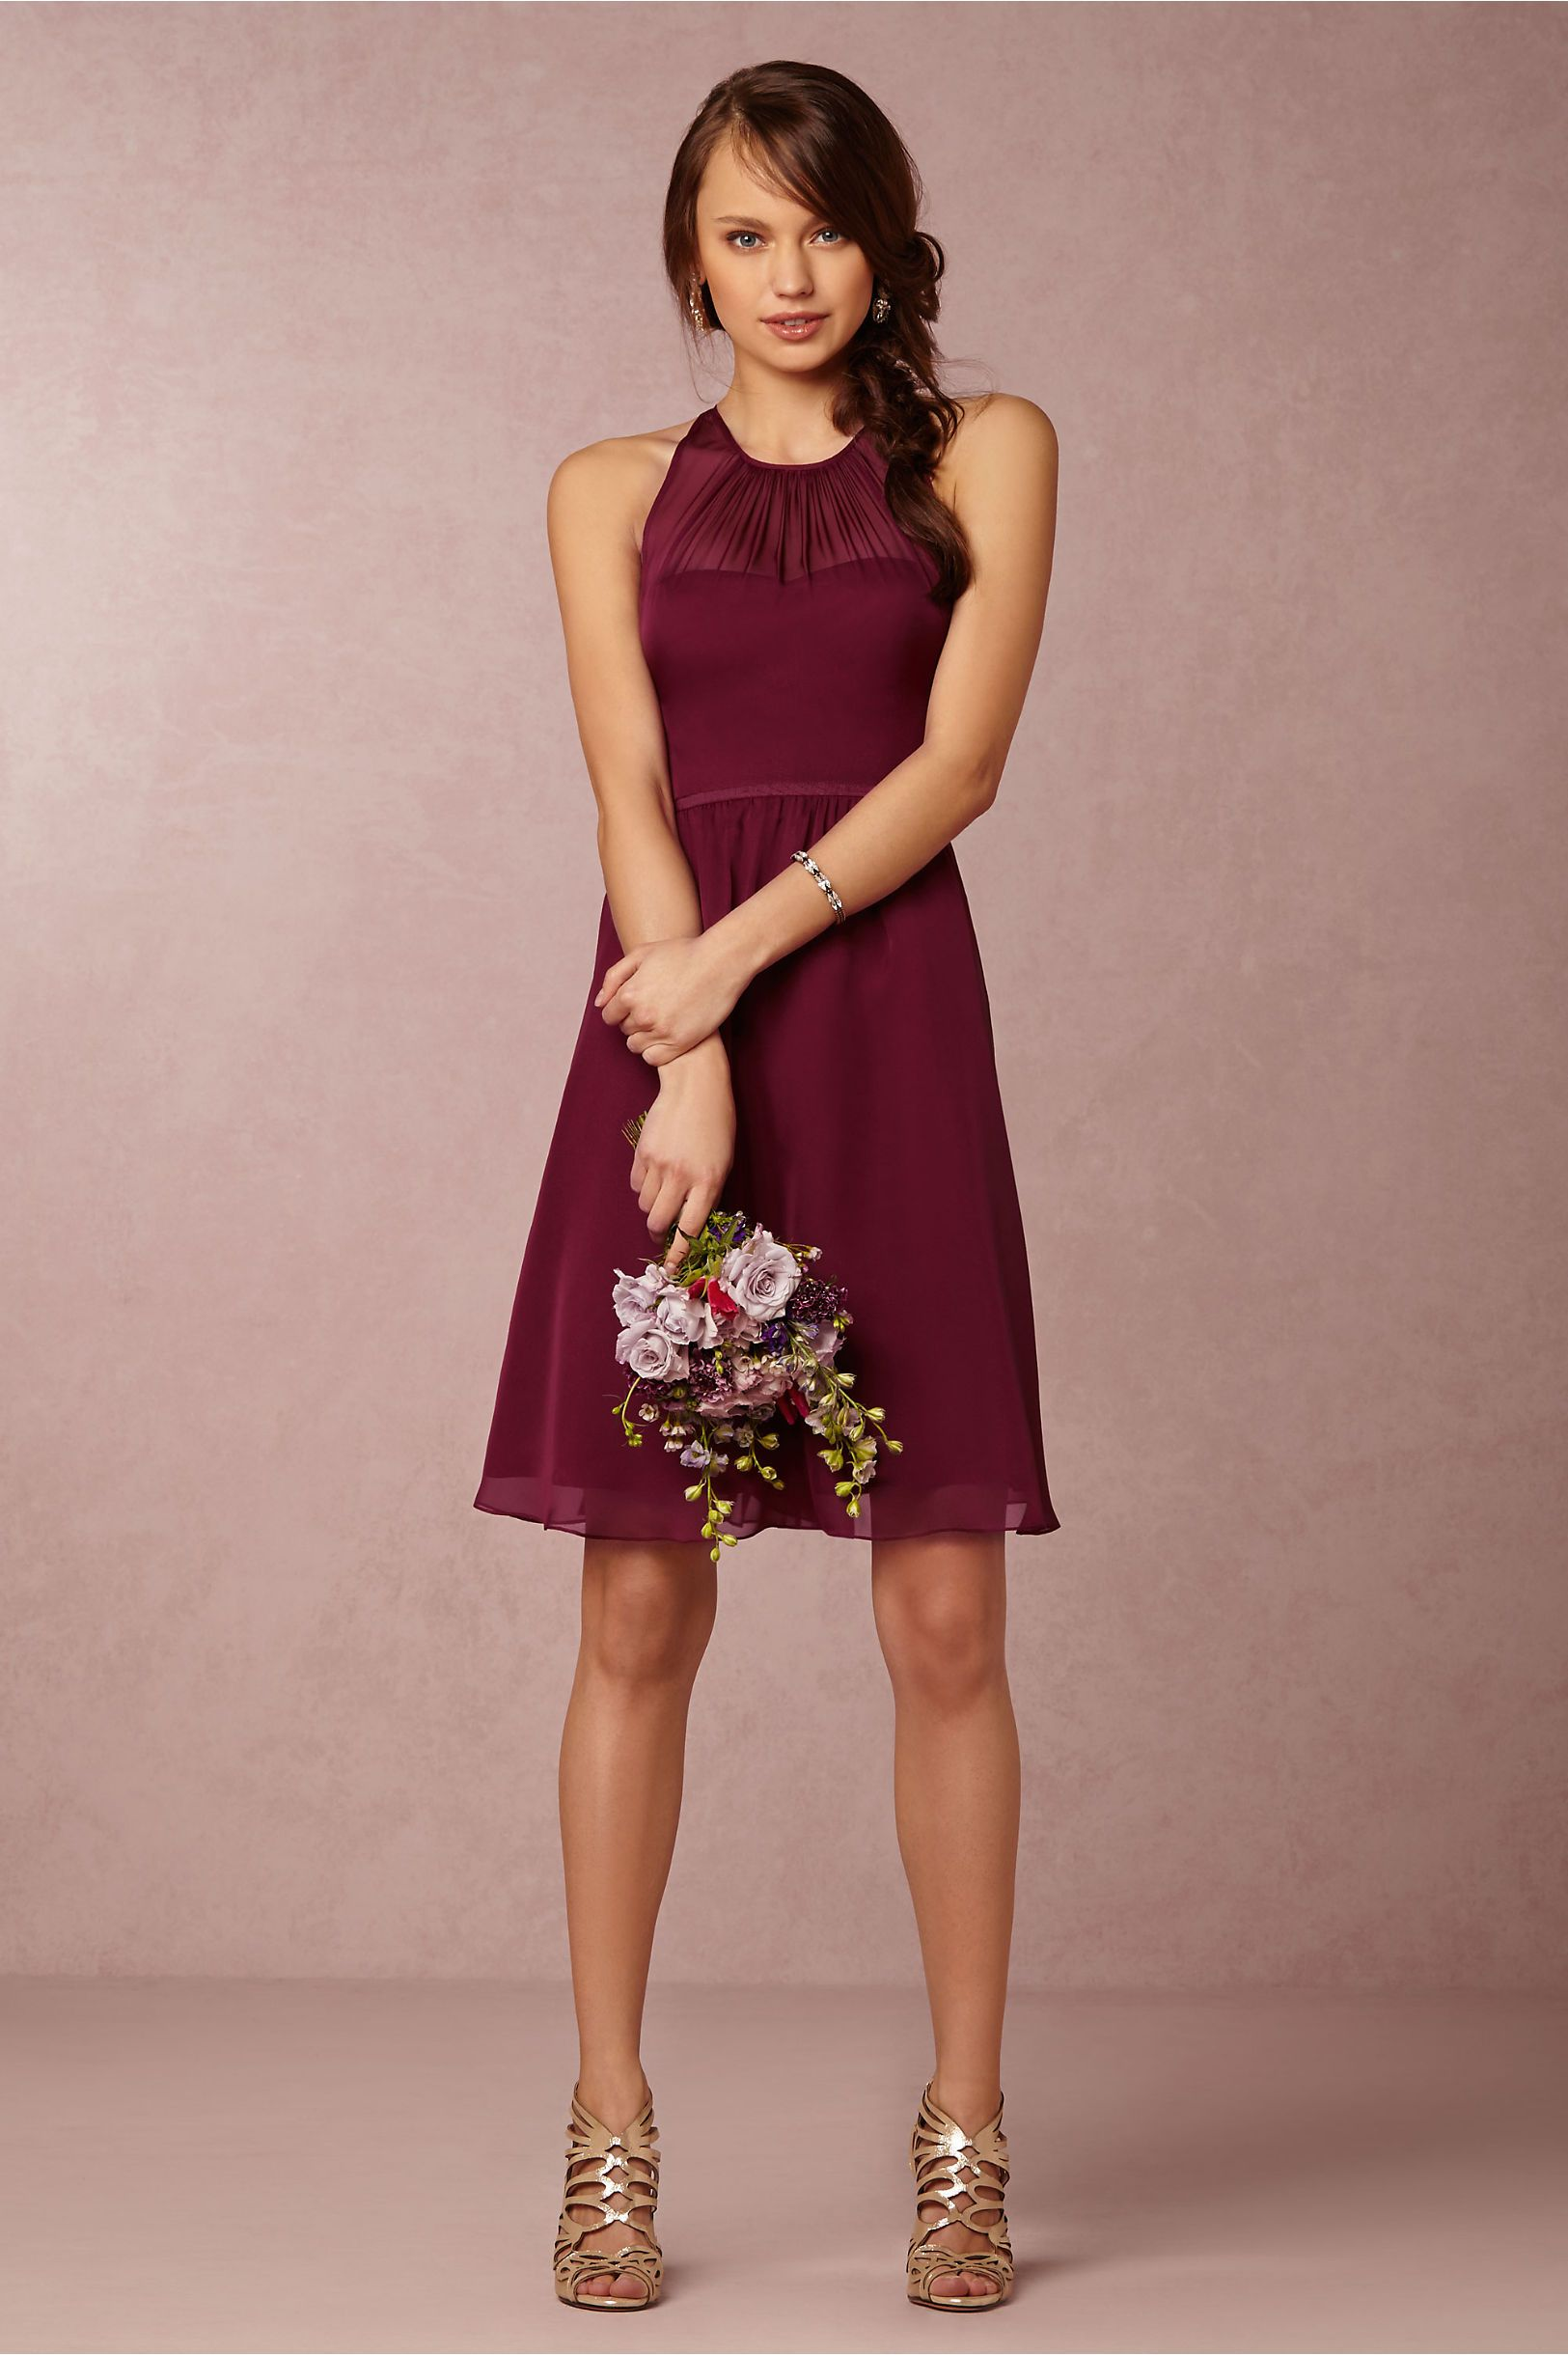 b873c071351 Georgina Dress from  BHLDN Weddings  wedding  registry   WishBigWinBigGiveaway